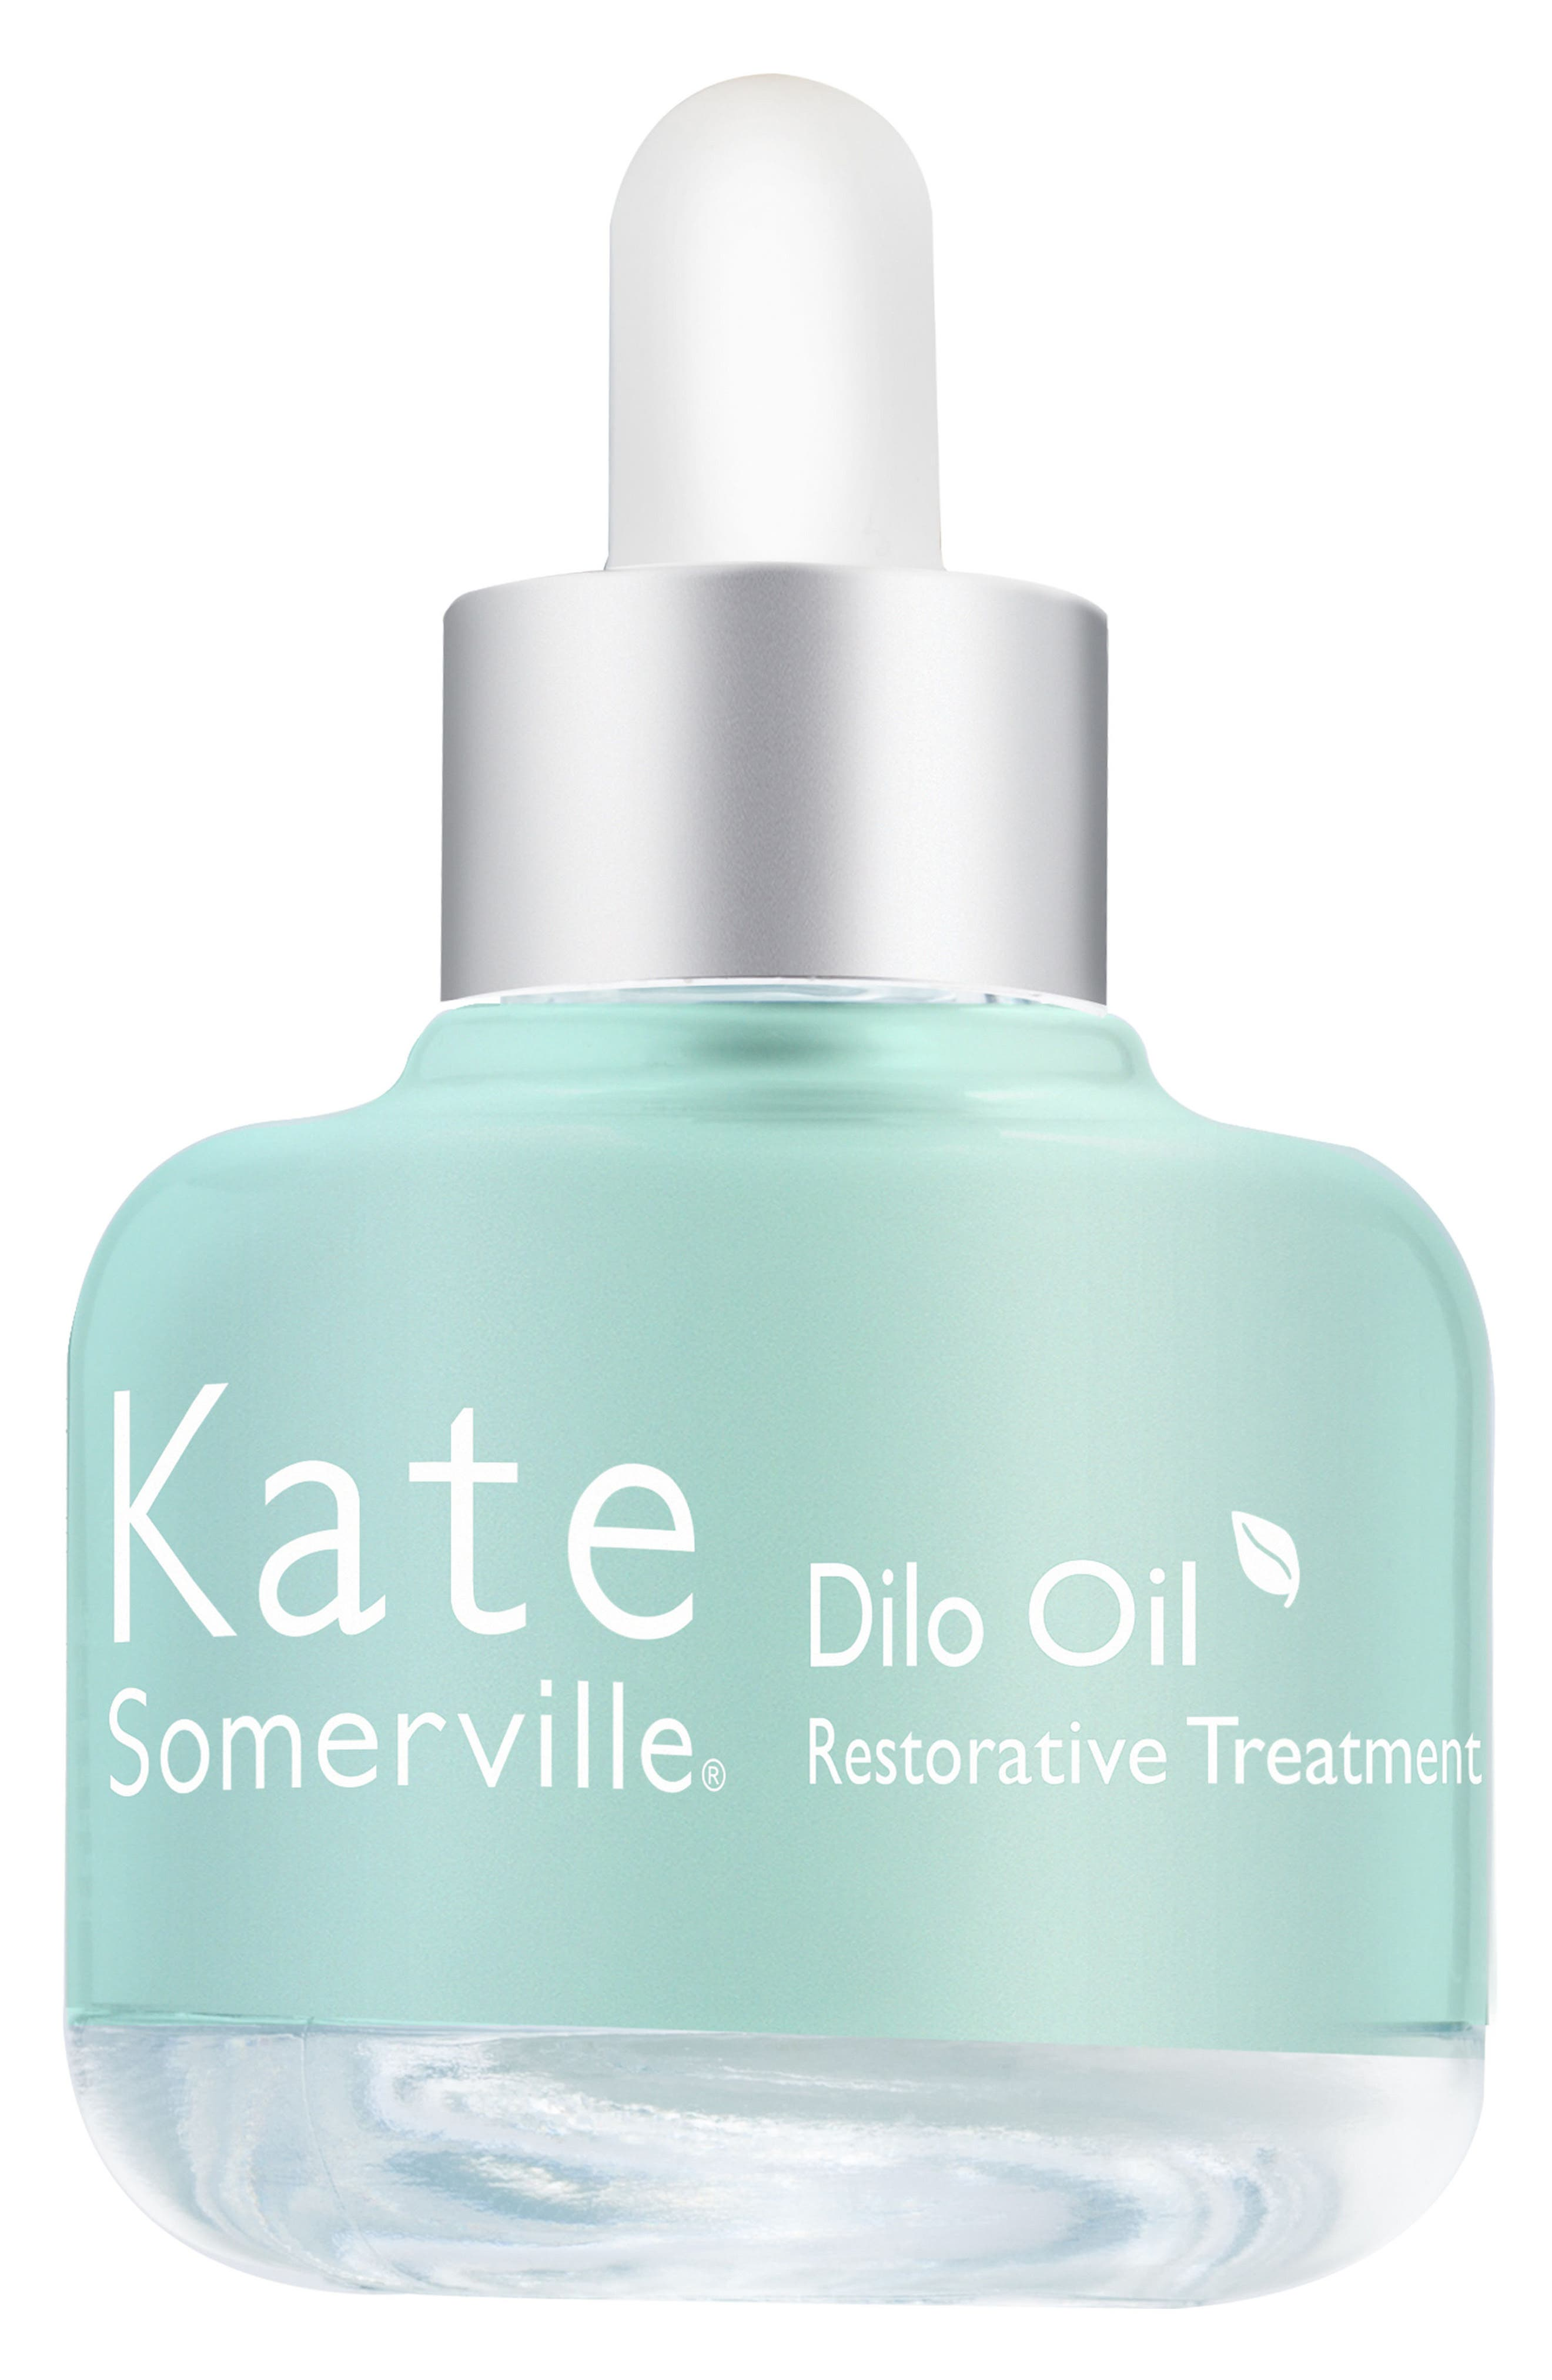 Main Image - Kate Somerville® Dilo Oil Restorative Treatment